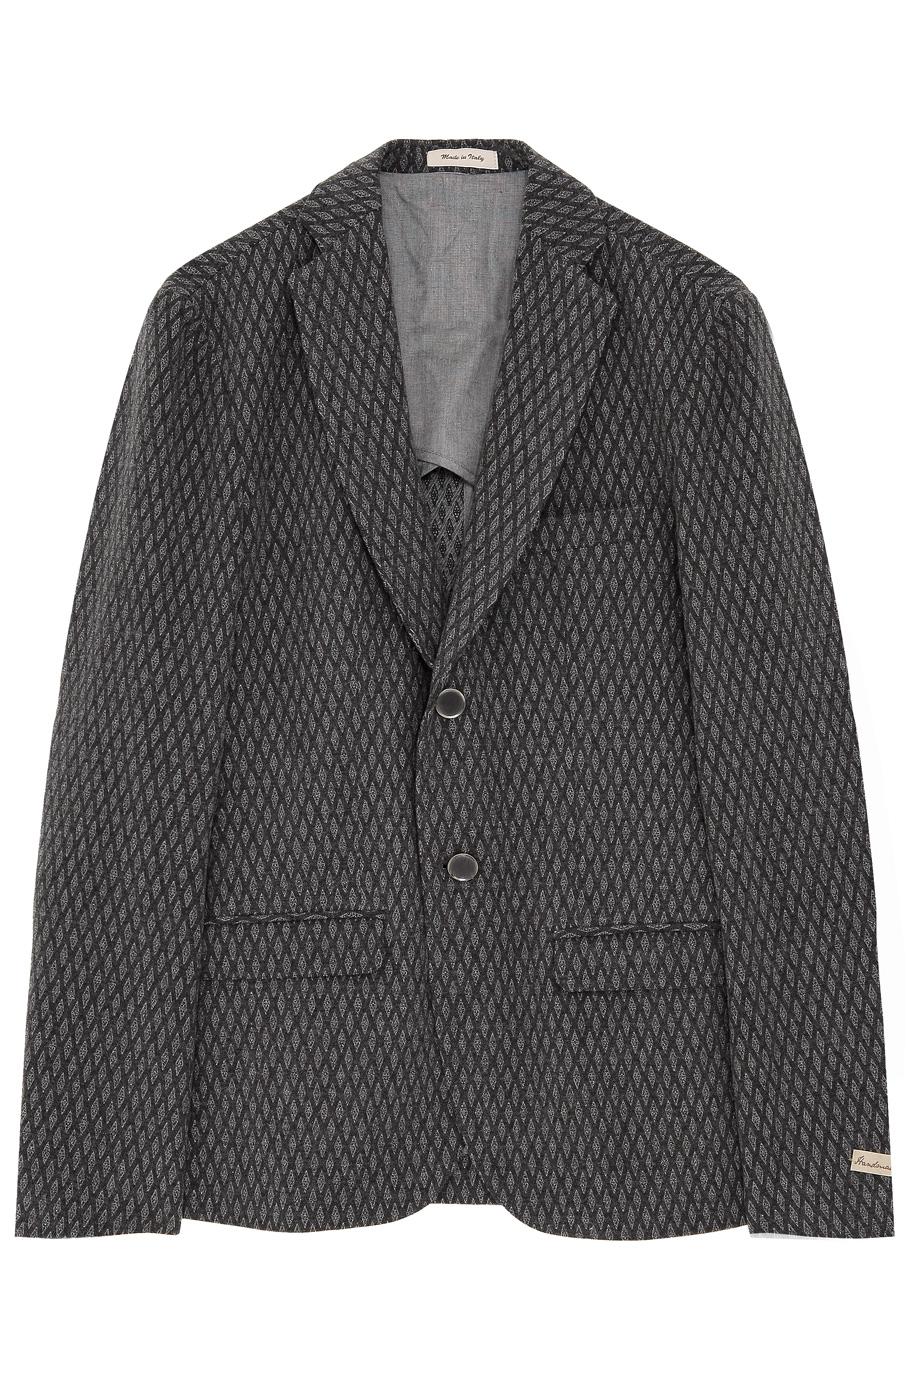 Lyst Mr Rick Tailor Diamond Jacquard Blazer In Gray